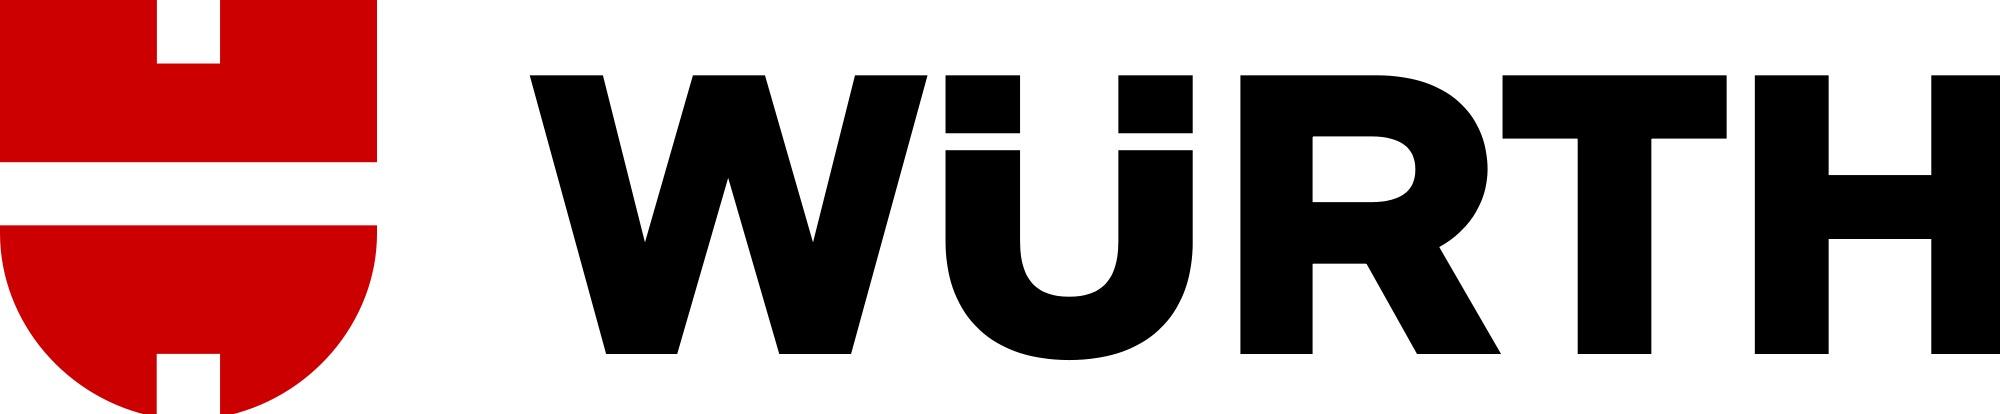 Sponsoren - Würth